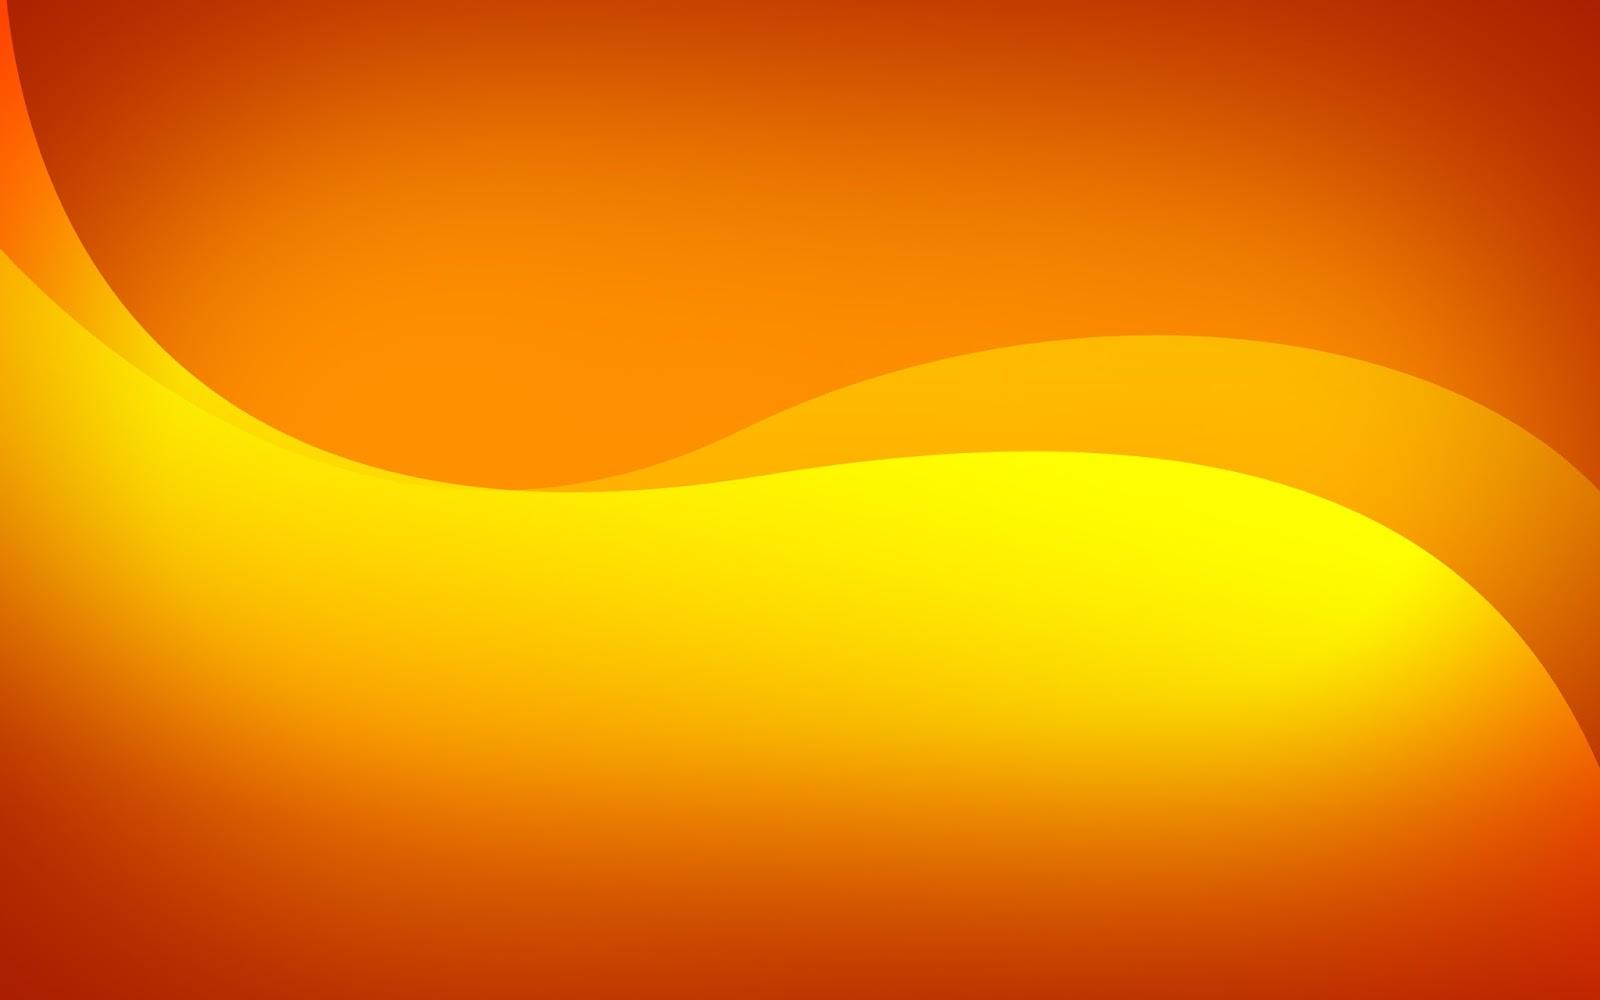 Imagetopia wallpapers amarillos y naranjas for Fondo blanco wallpaper